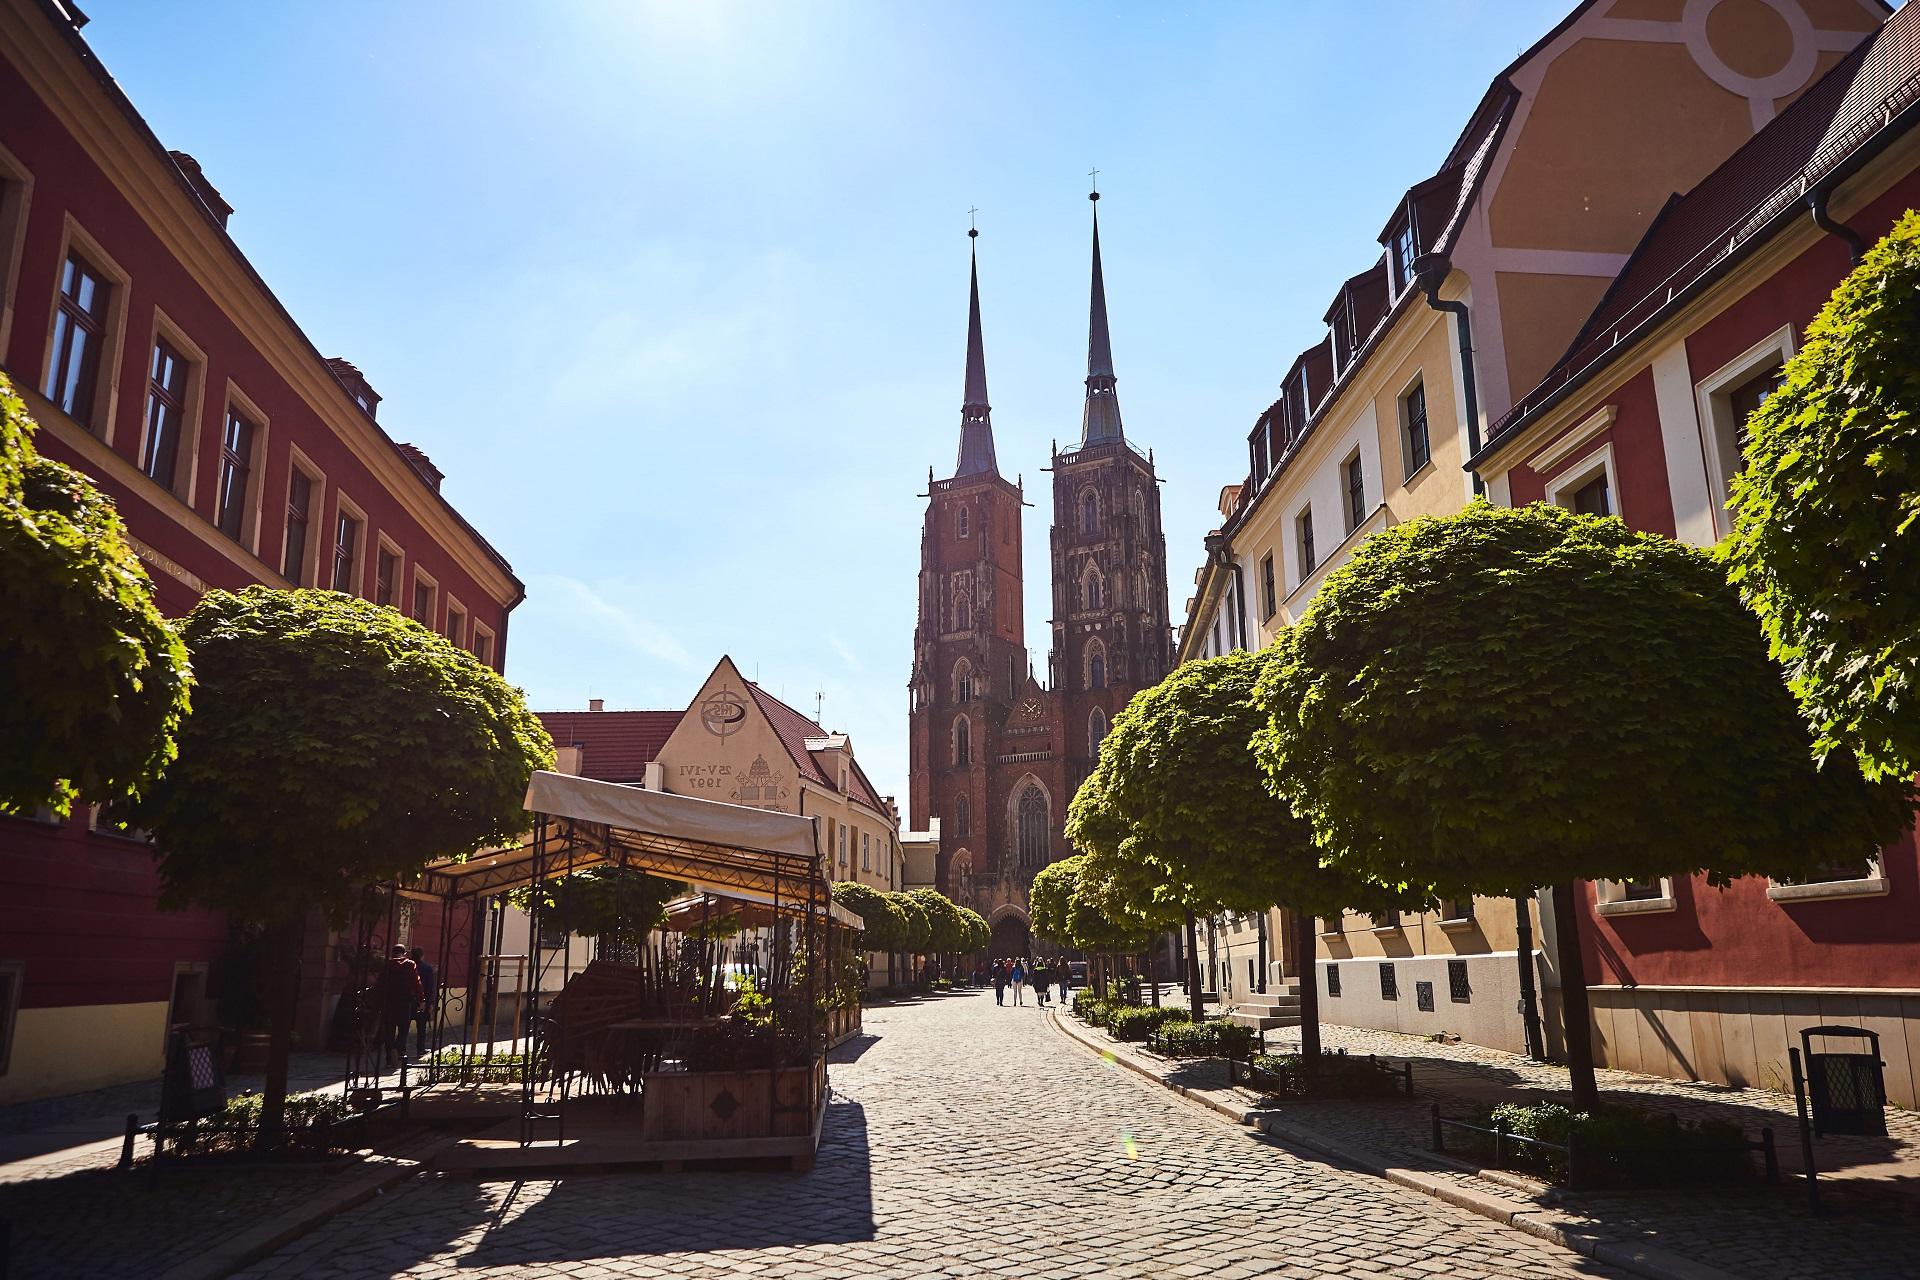 cathedral-st-john-baptist-tumski-island-wroclaw-city-popular-tourist-sight-poland